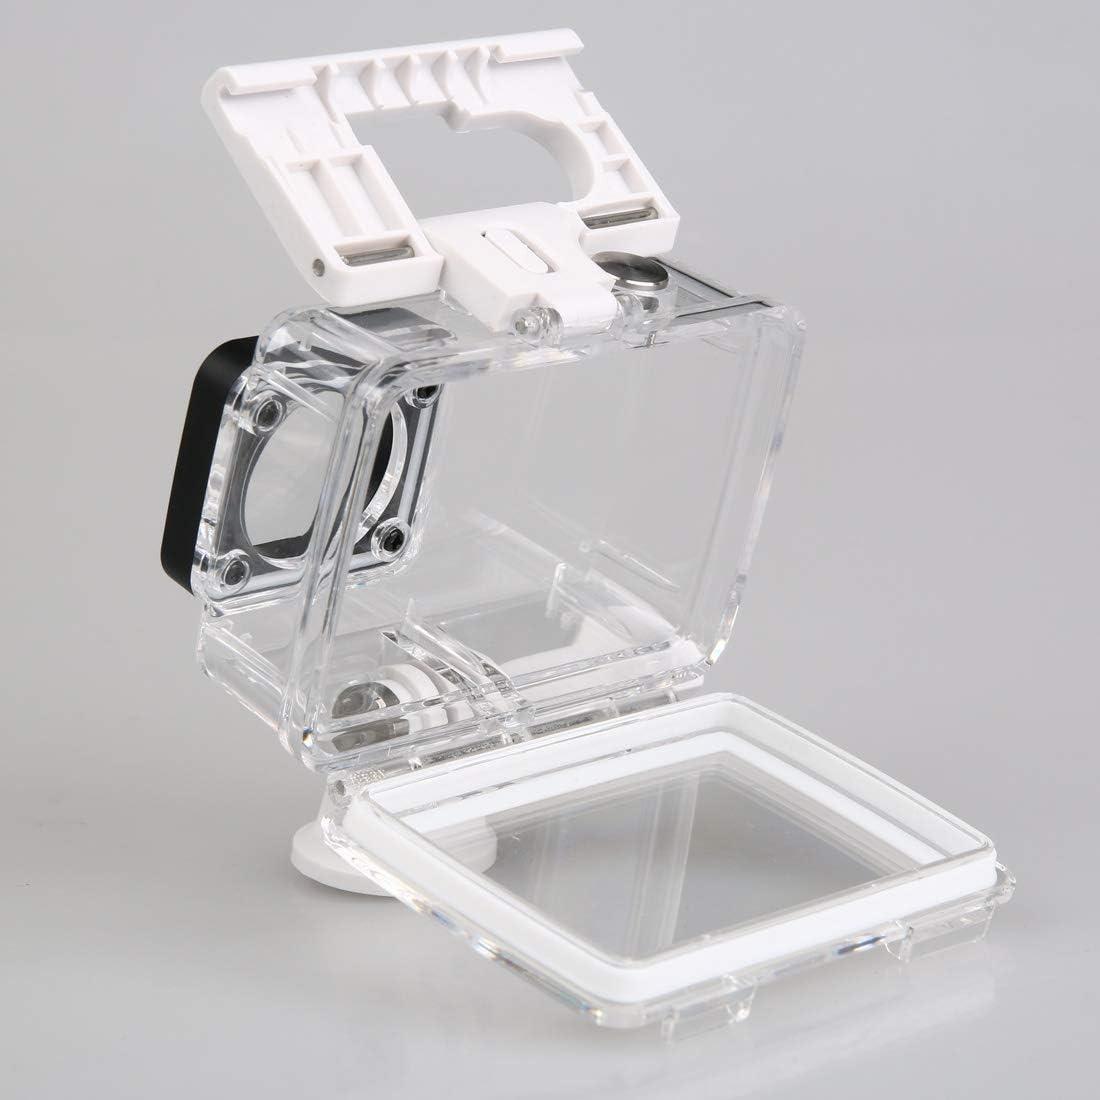 VKeyueDa Waterproof Depth: 40m Color : White White VKeyueDa IP68 Waterproof Housing Protective Case with Buckle Basic Mount for Xiaomi Xiaoyi II 4K Z16FSK01